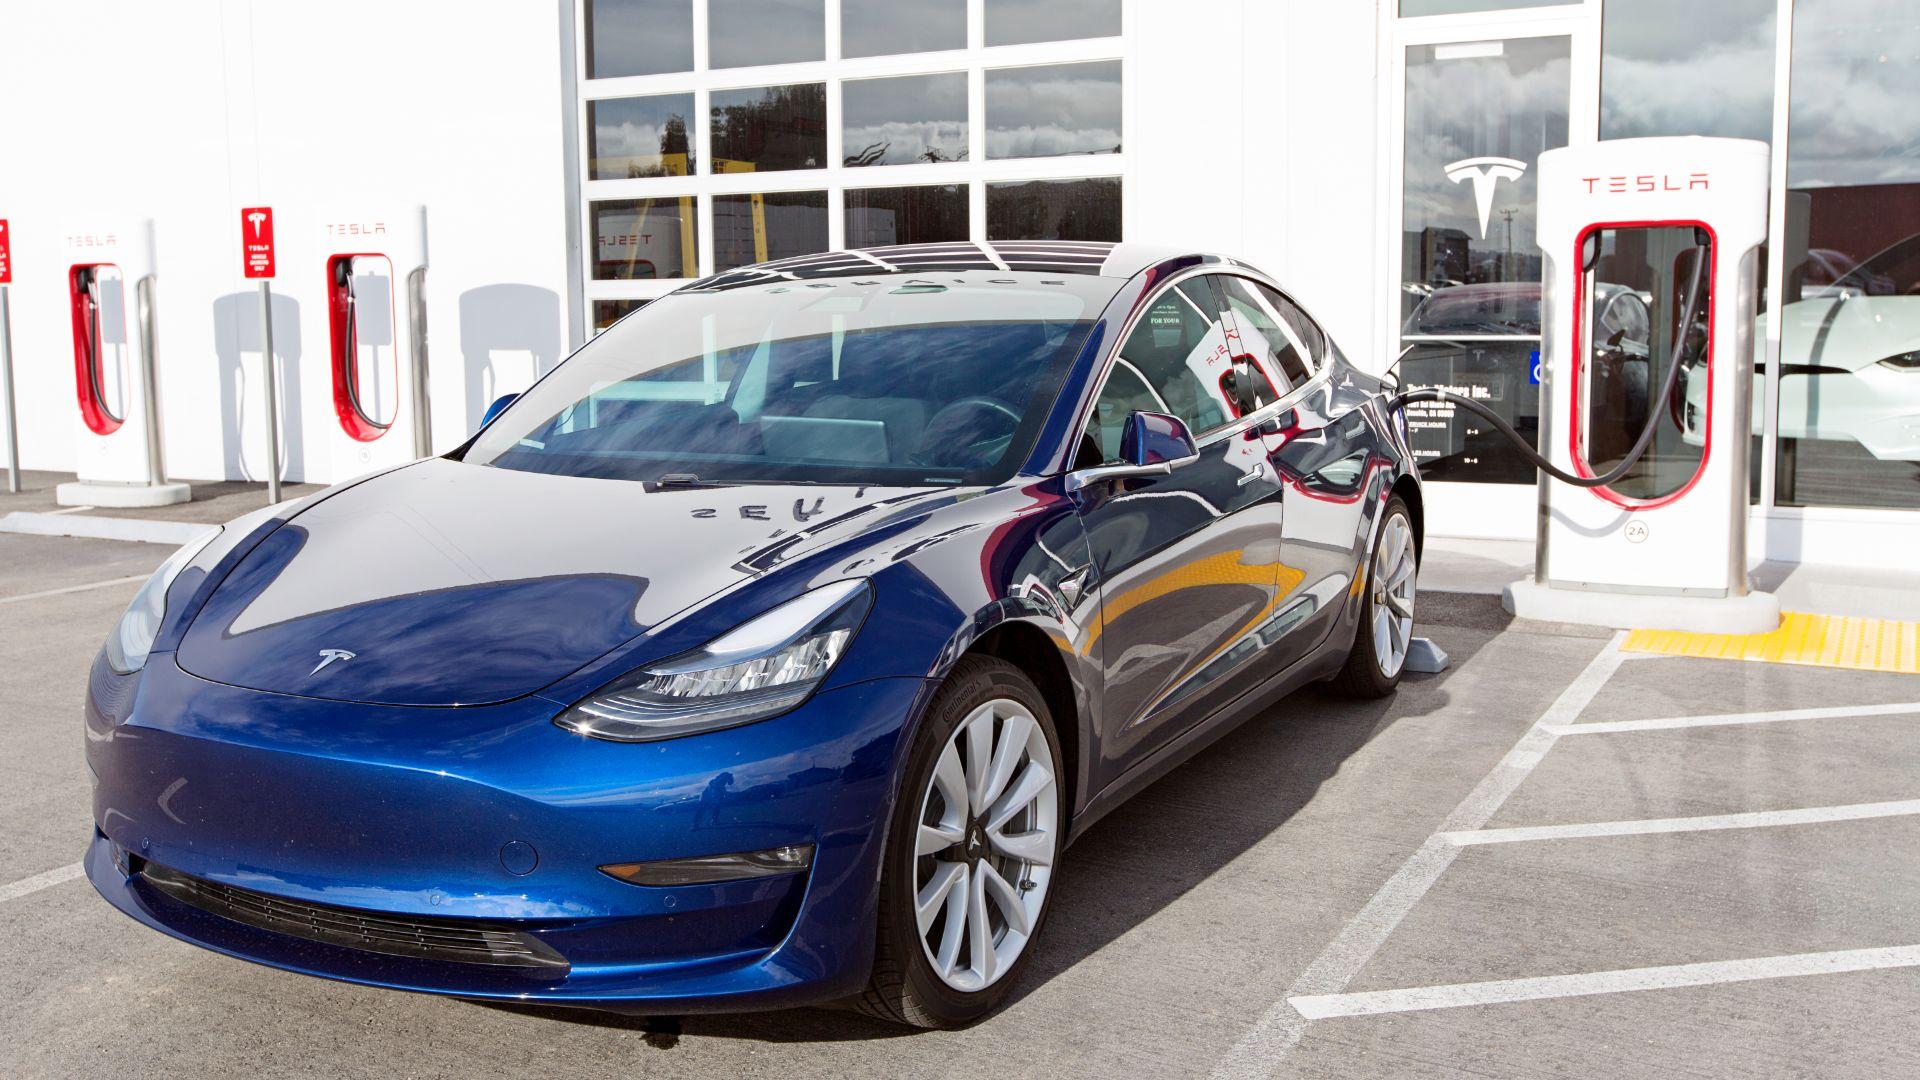 Tesla Model 3 Thatcham security criticism